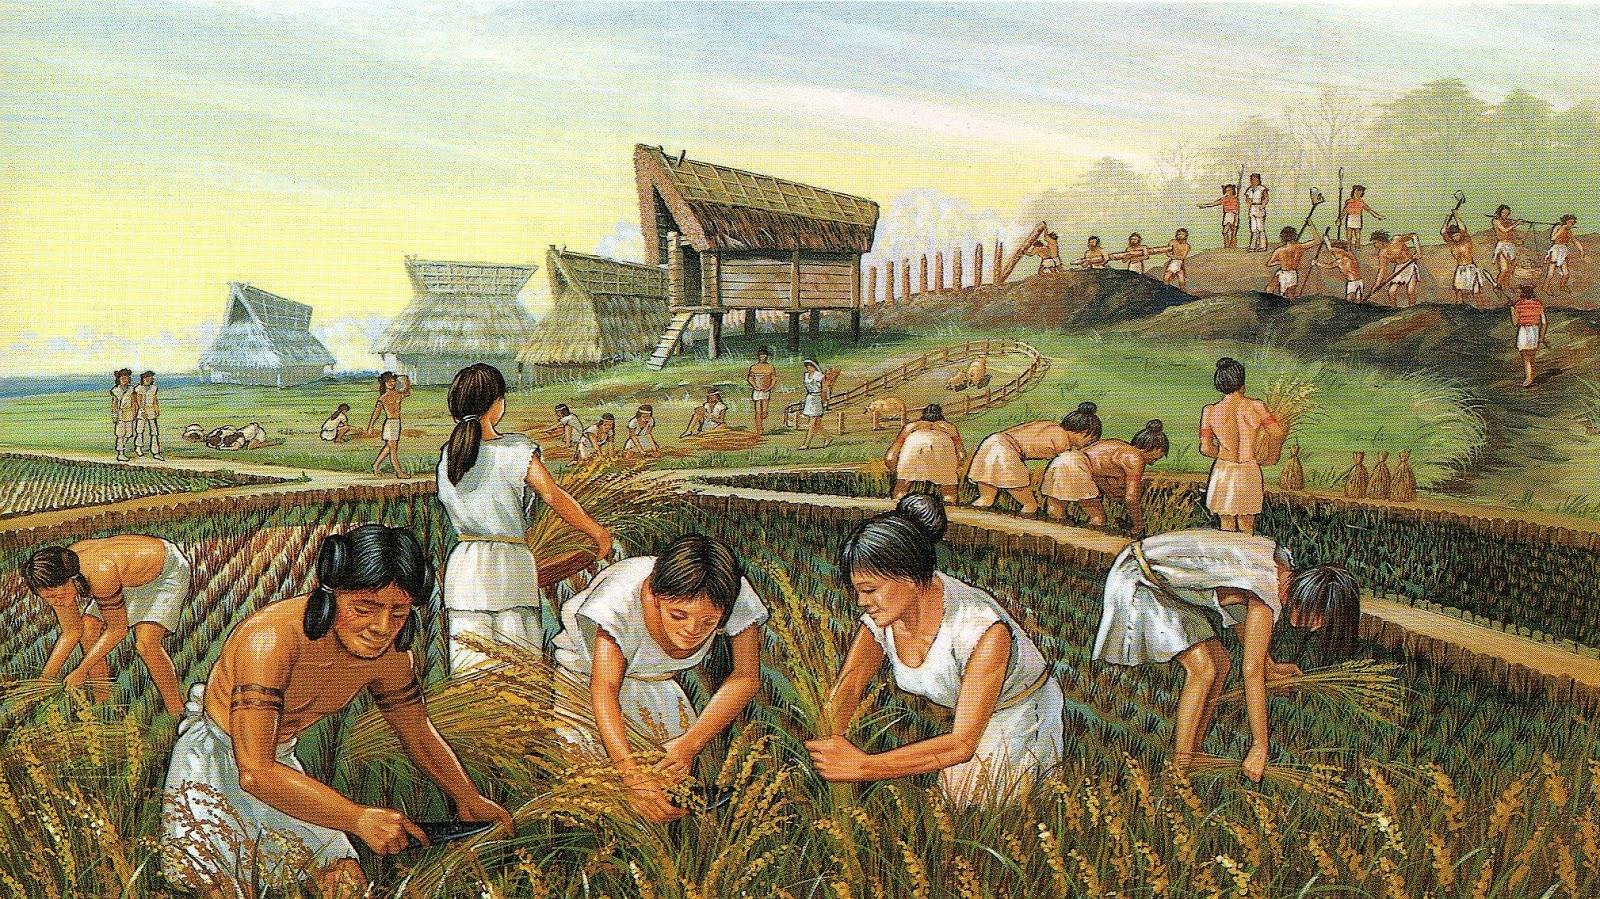 Un grupo de esqueletos aporta claves sobre el origen de la agricultura